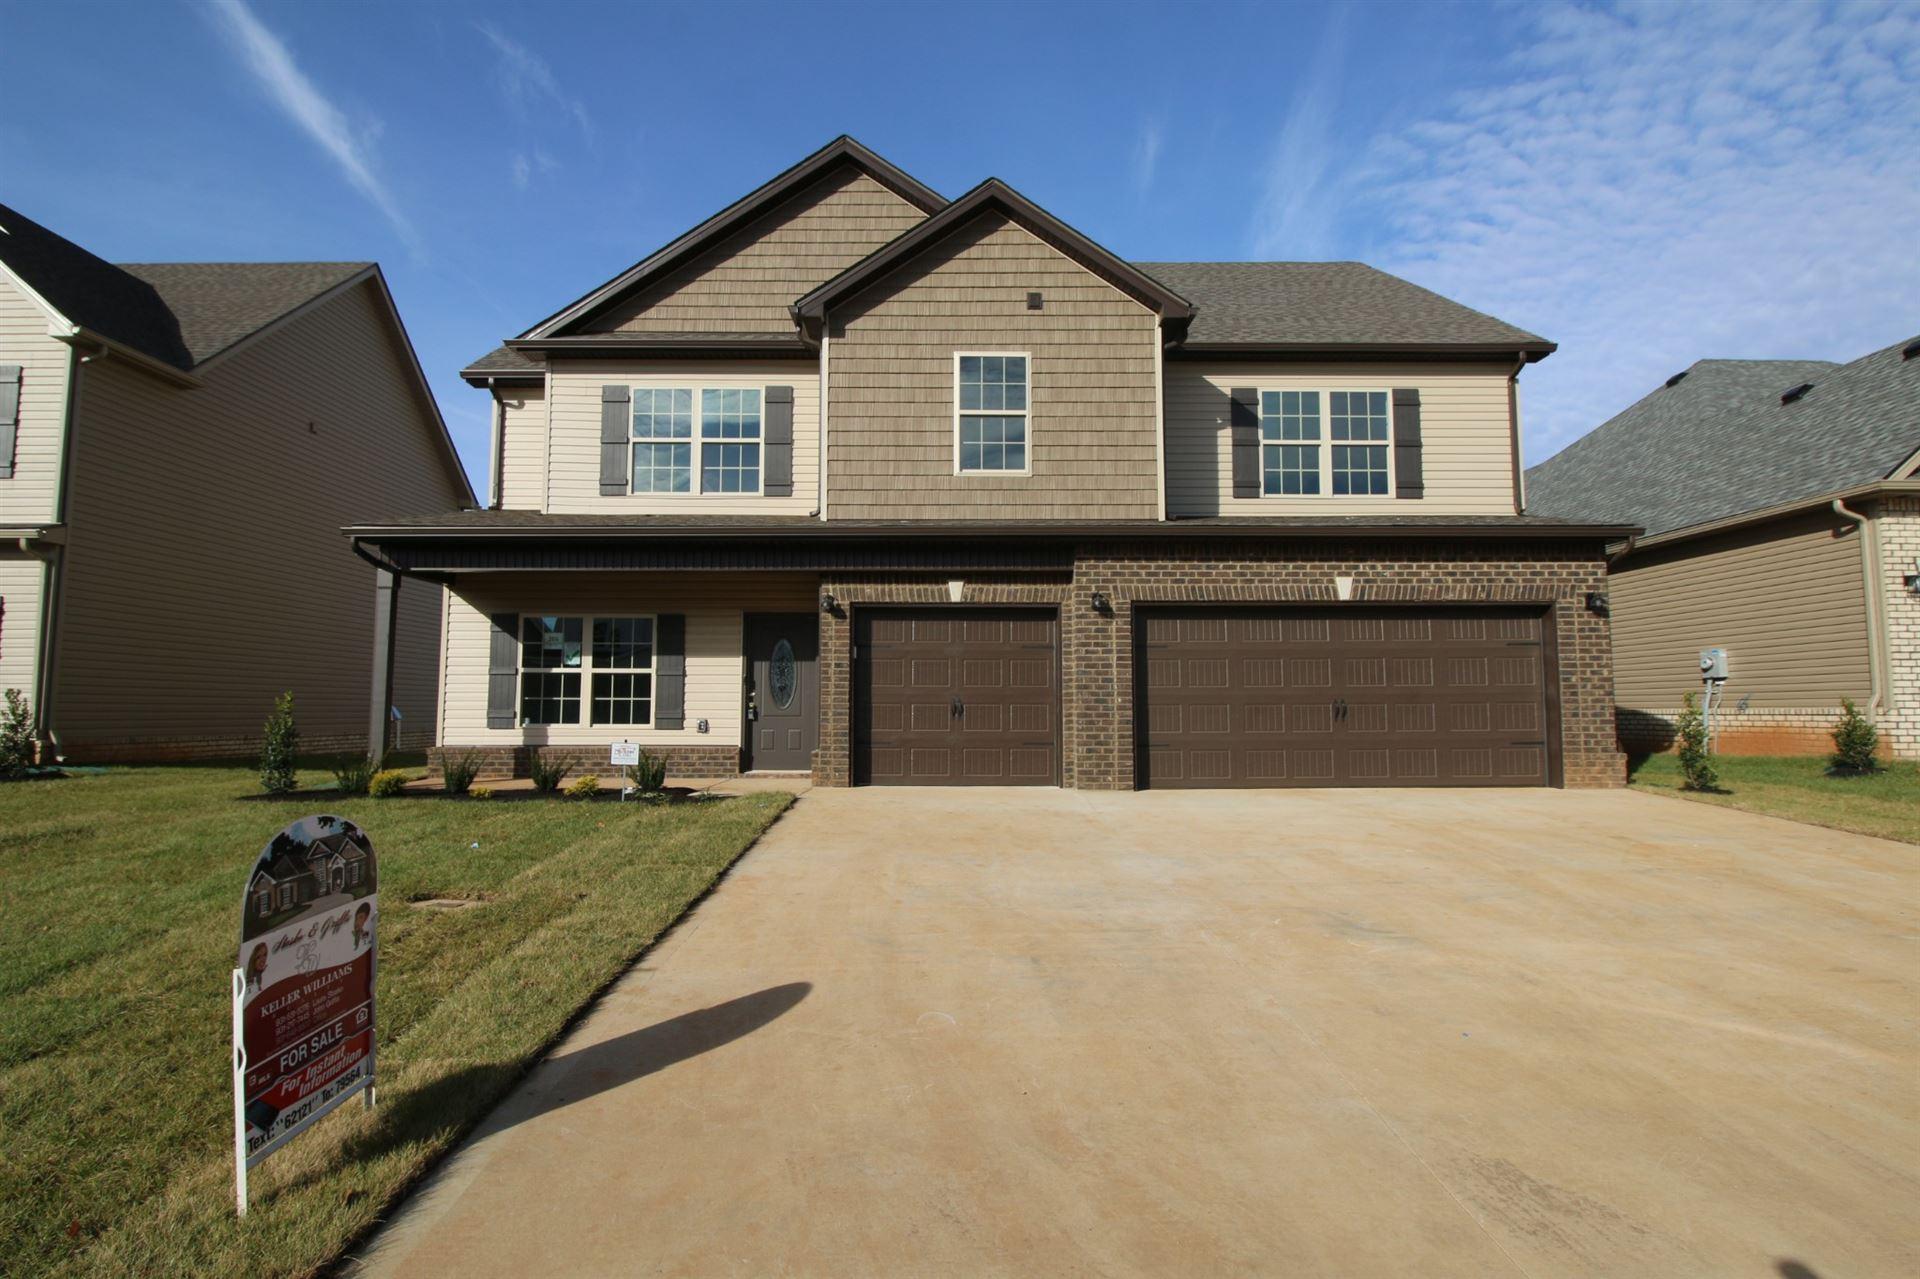 206 Mills Creek, Clarksville, TN 37042 - MLS#: 2283825